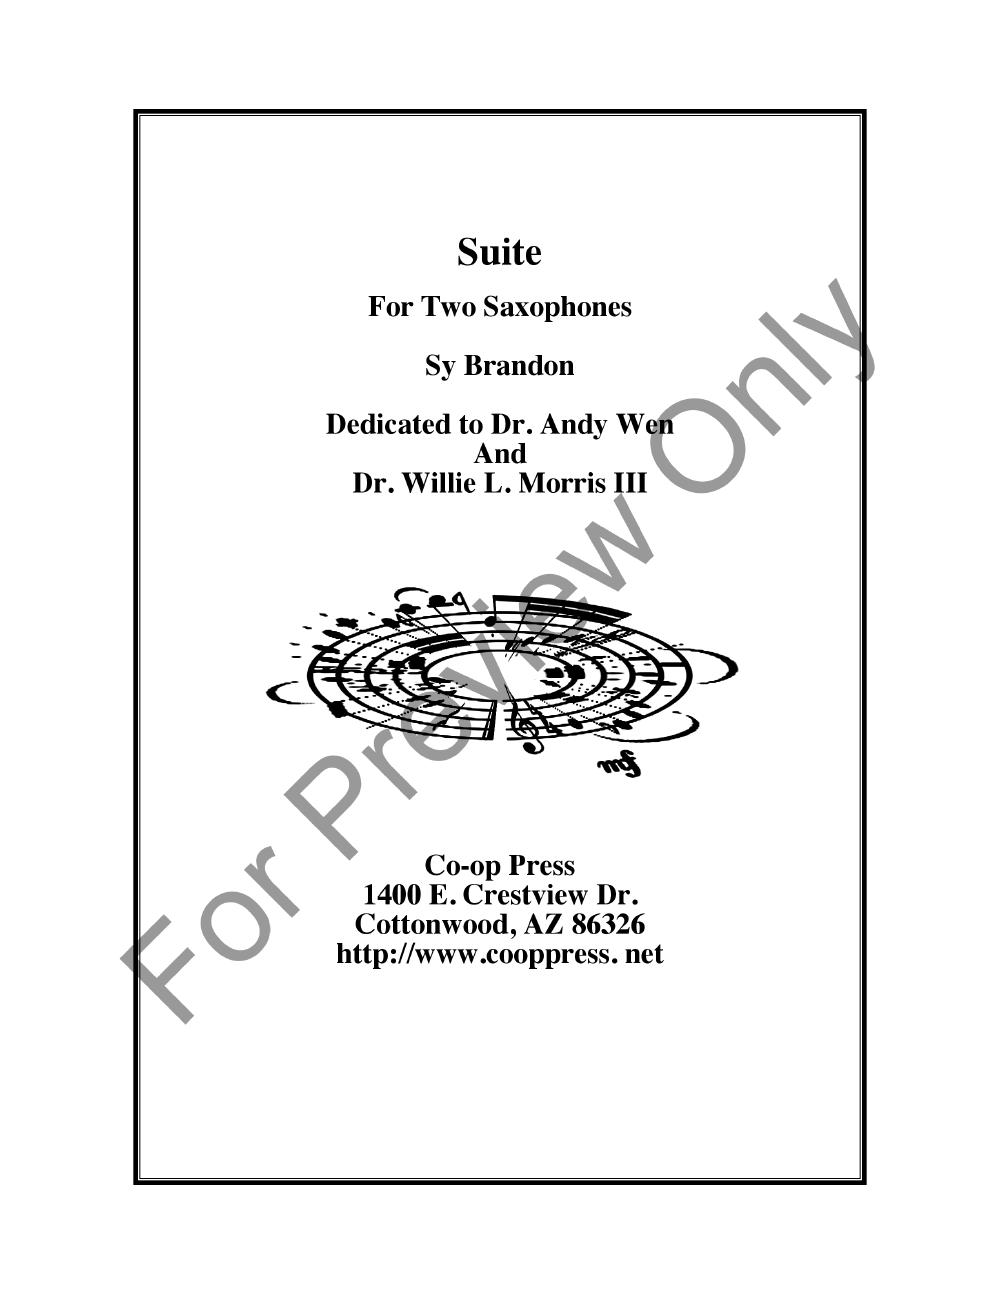 Suite for Two Saxophones Thumbnail